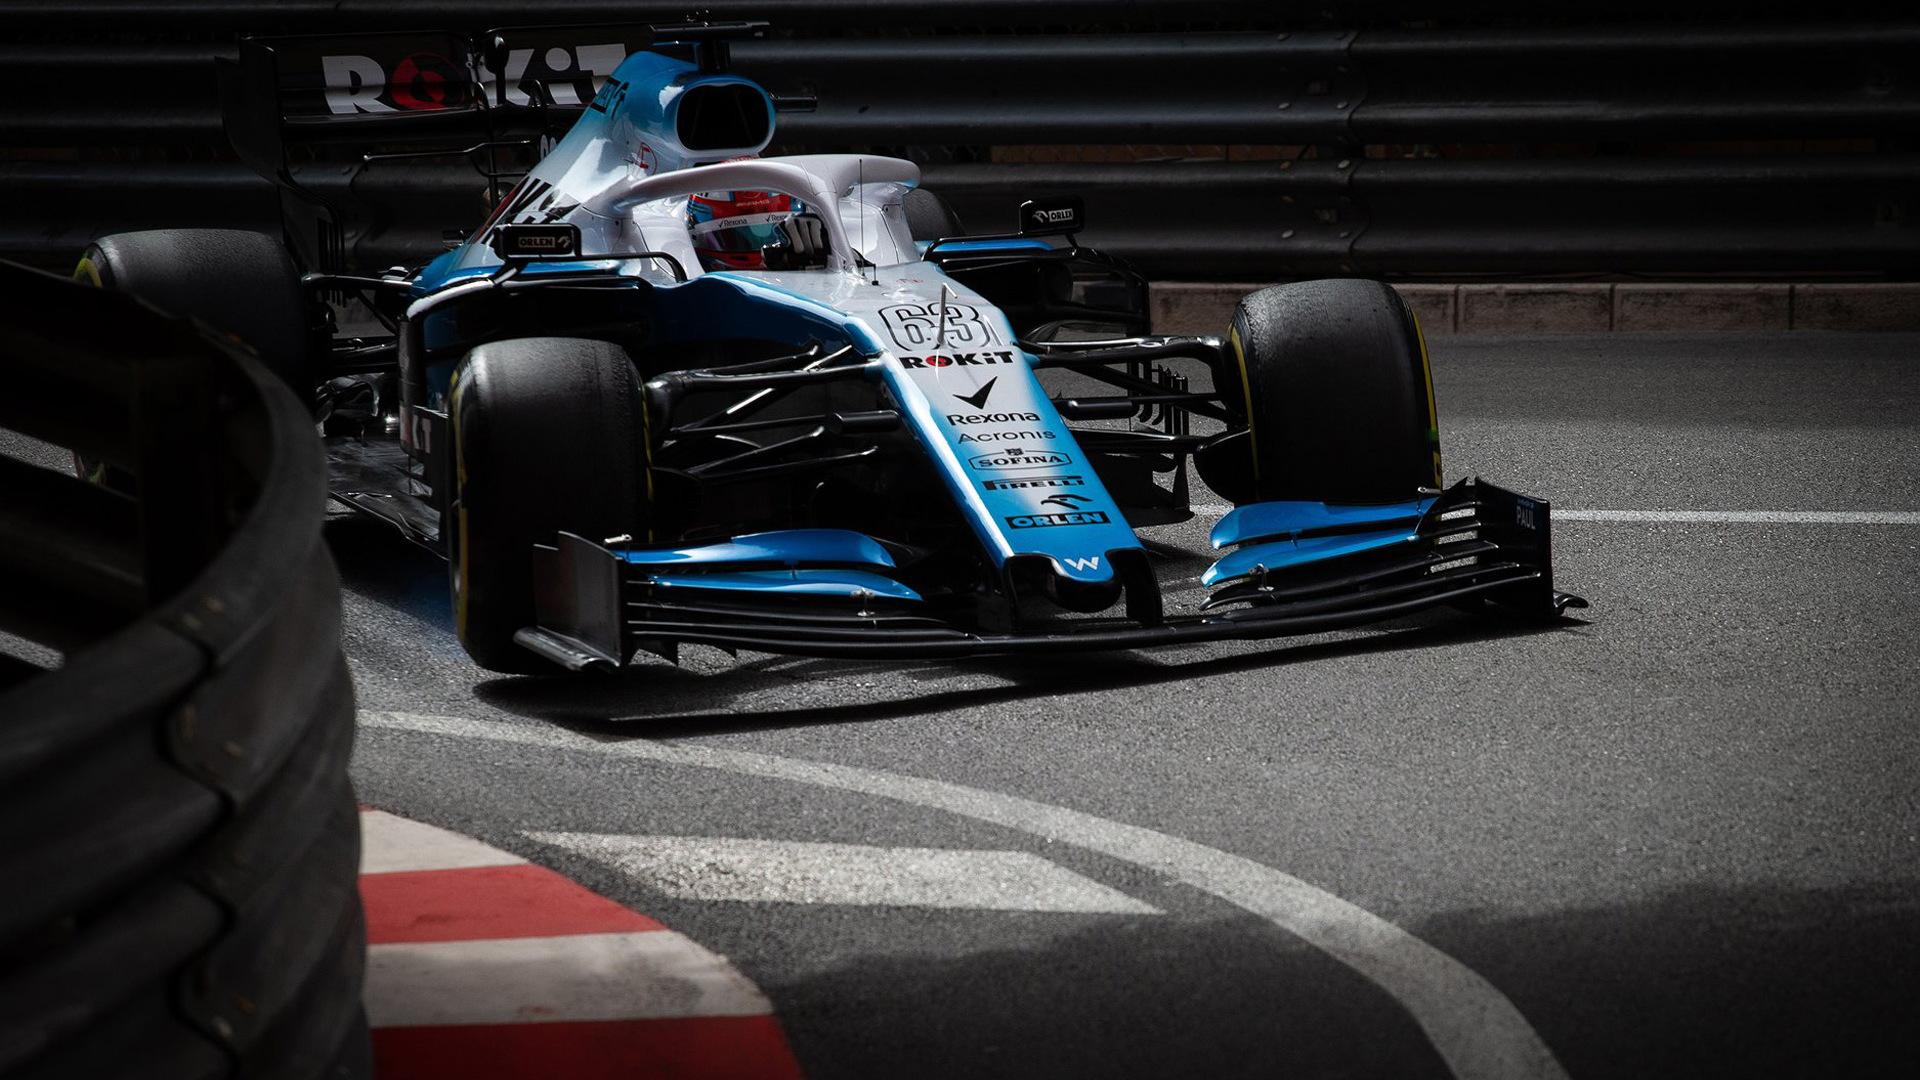 2019 Williams FW42 Formula One race car